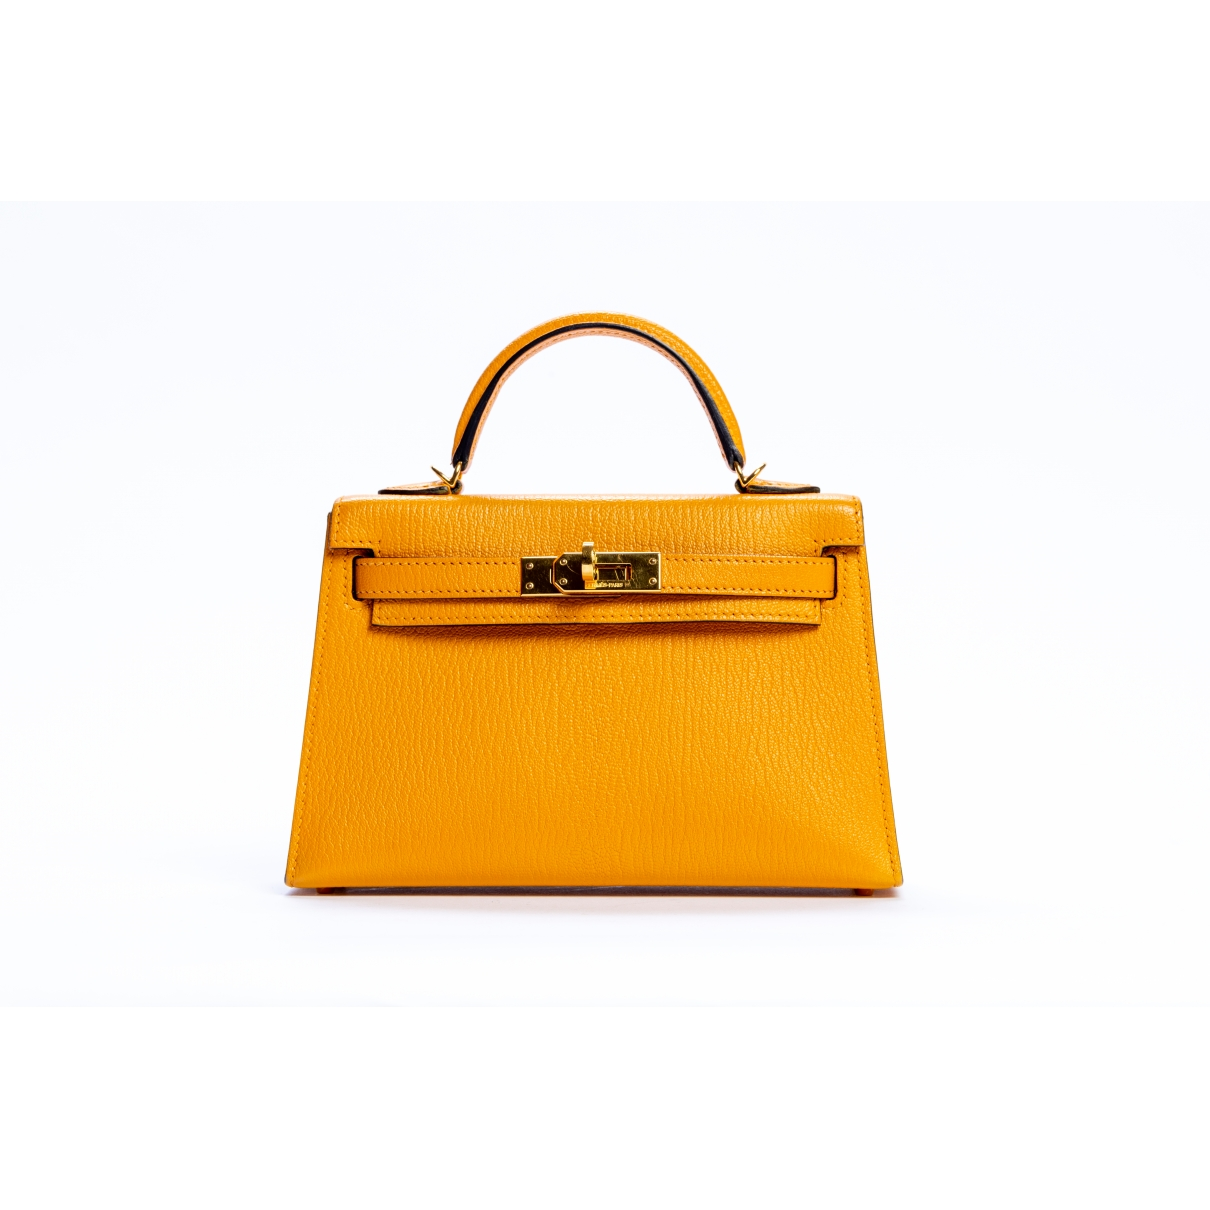 Hermes - Sac a main Kelly Mini pour femme en cuir - jaune